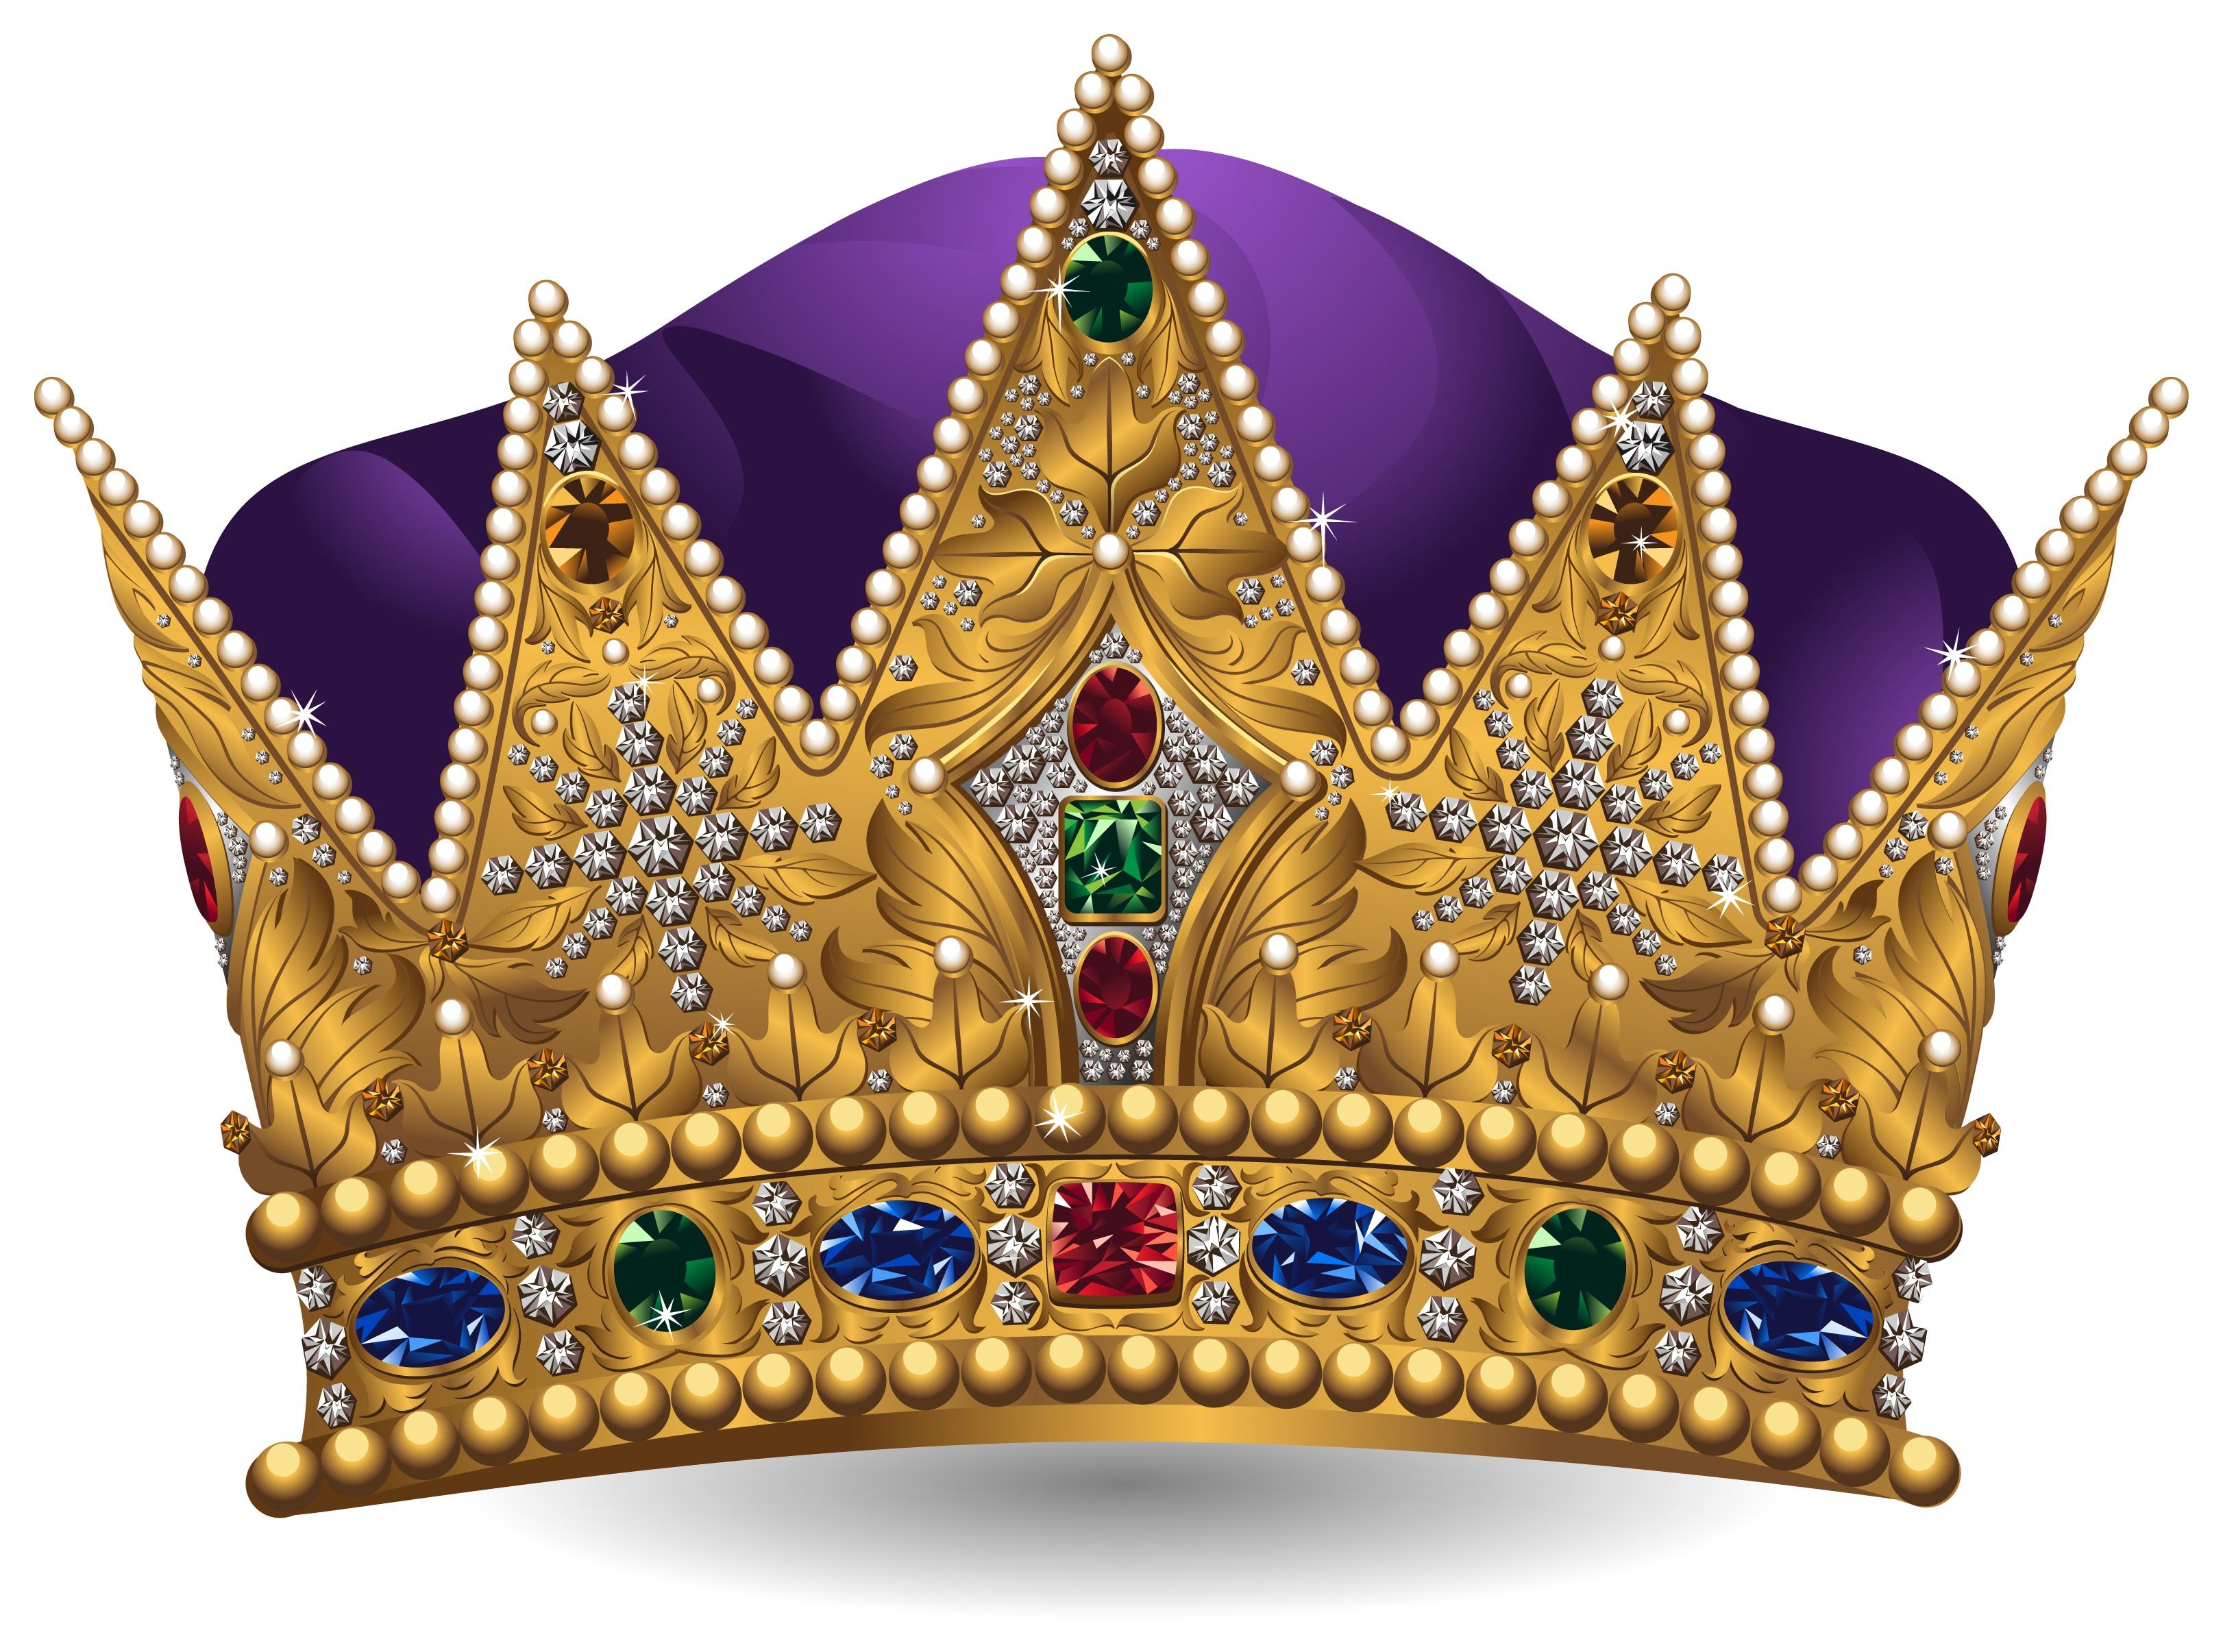 Gems clipart crown jewels Crowning Millennial crown King Prophecies